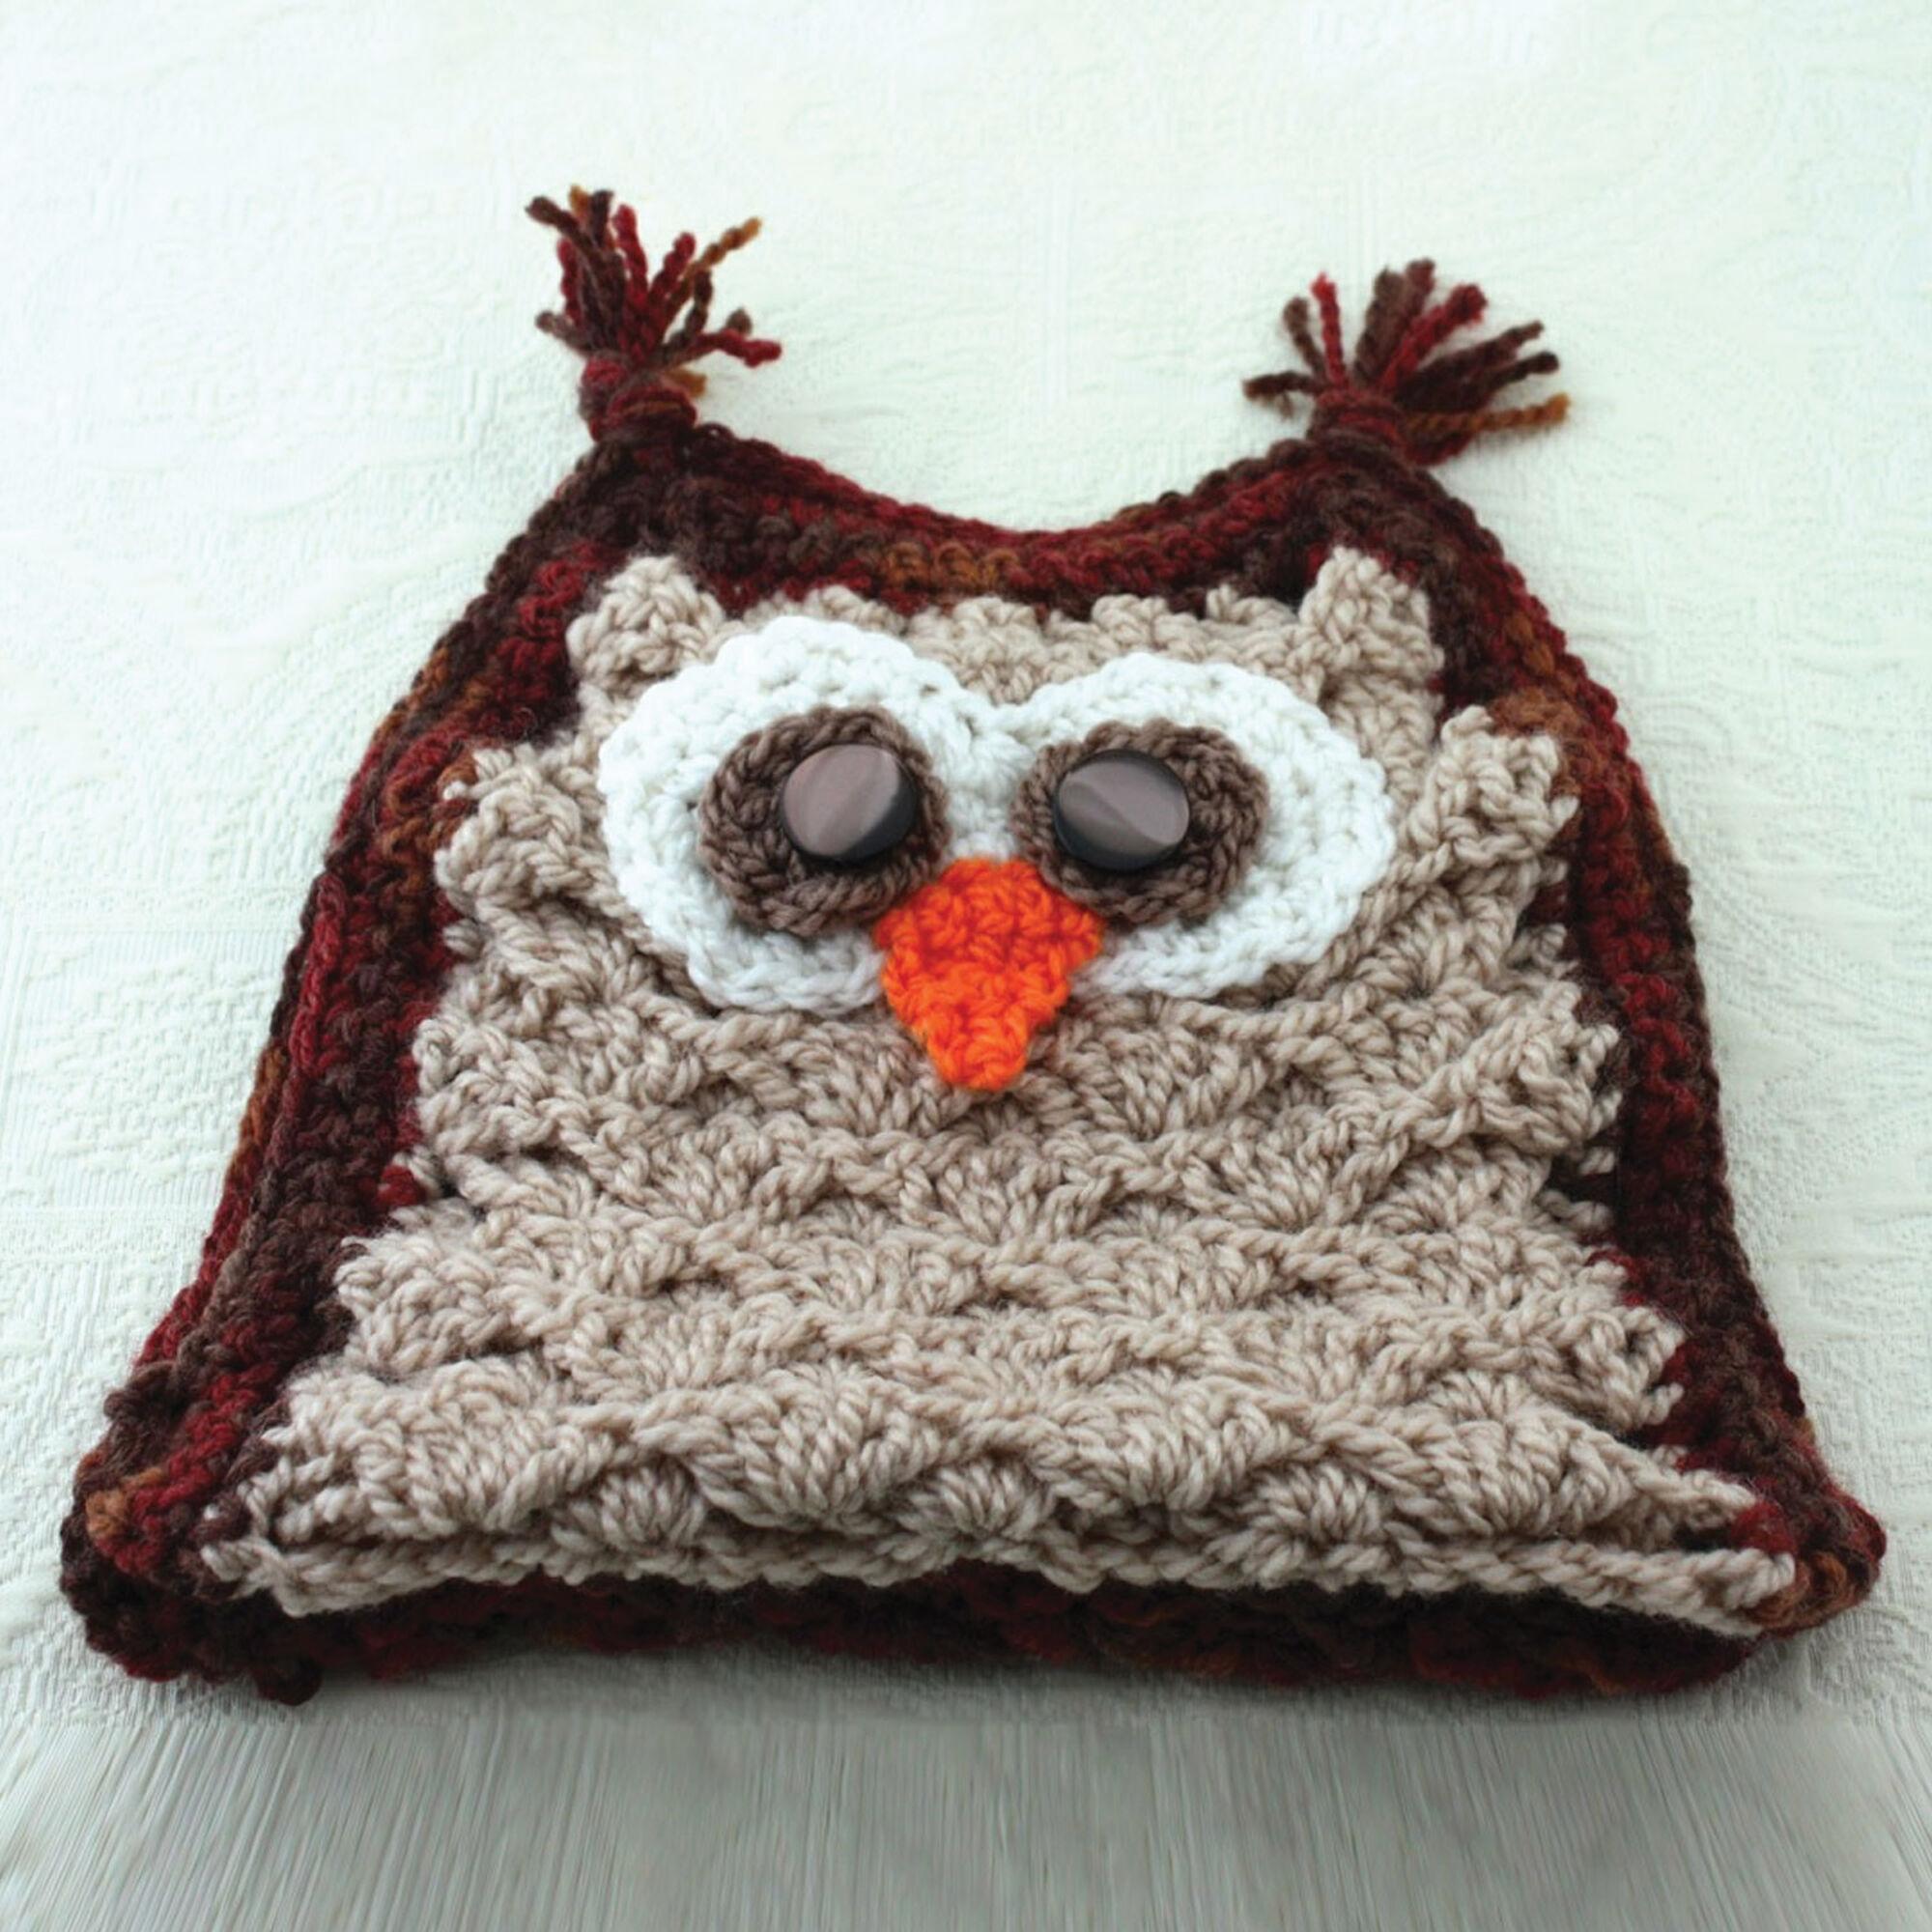 3 Skeins Peaches /& Cr\u00e8me Yarnspirations Red Yarn,100/% Cotton,4 Ply Worsted,Tea Cozy,Dish Cloth,Macrame,Knitting,Crochet Yarn,Fiber,Notion